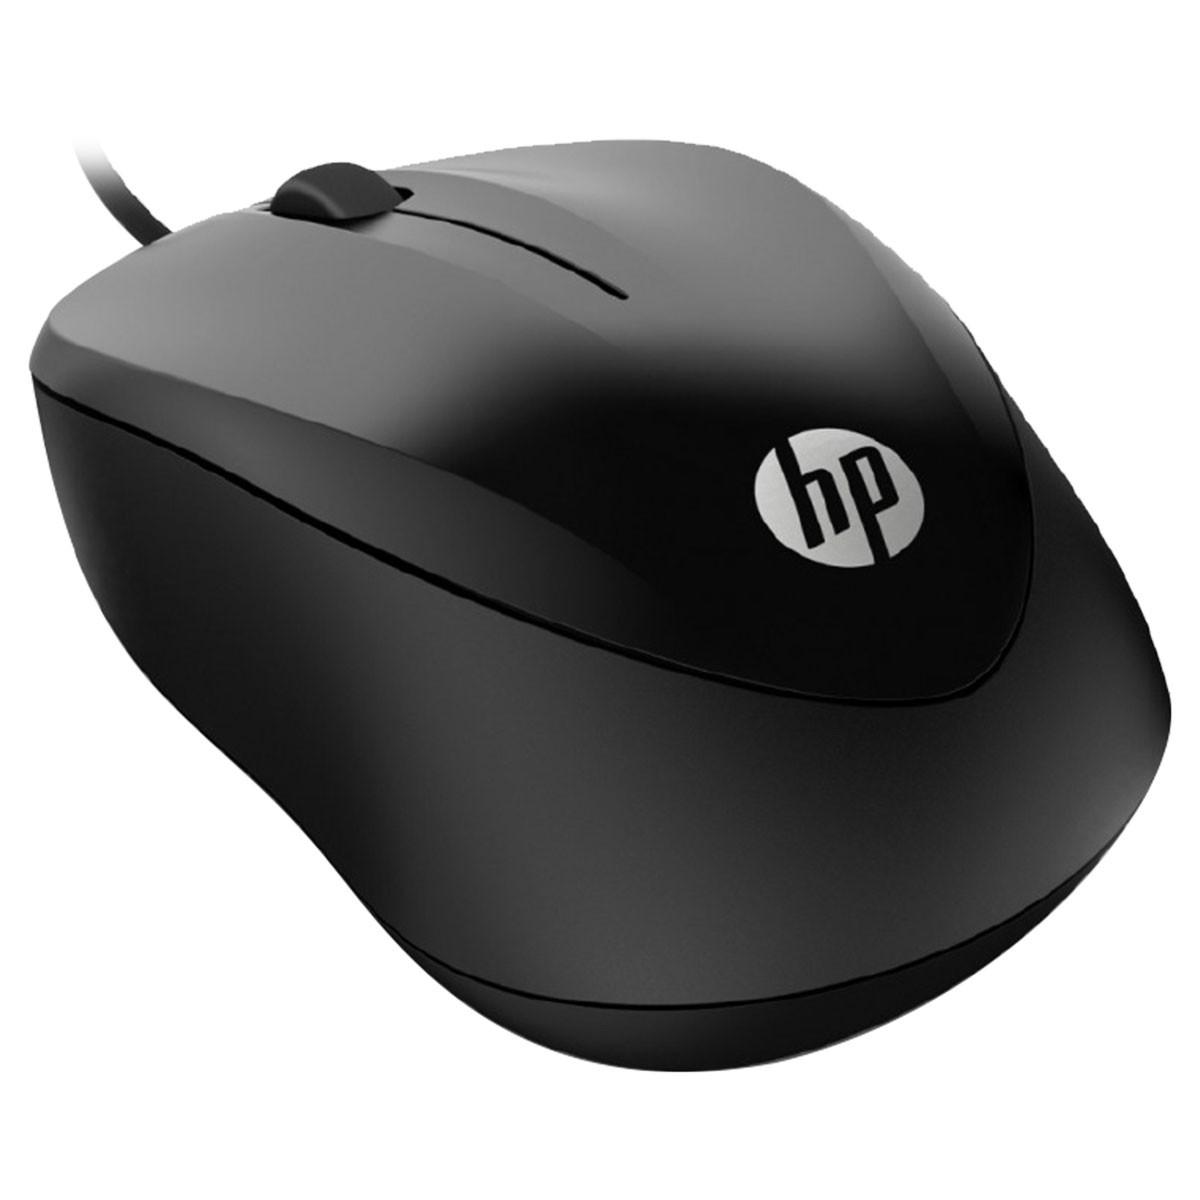 Mouse USB 1000 1200DPI Comprimento do Cabo 1,5M Preto